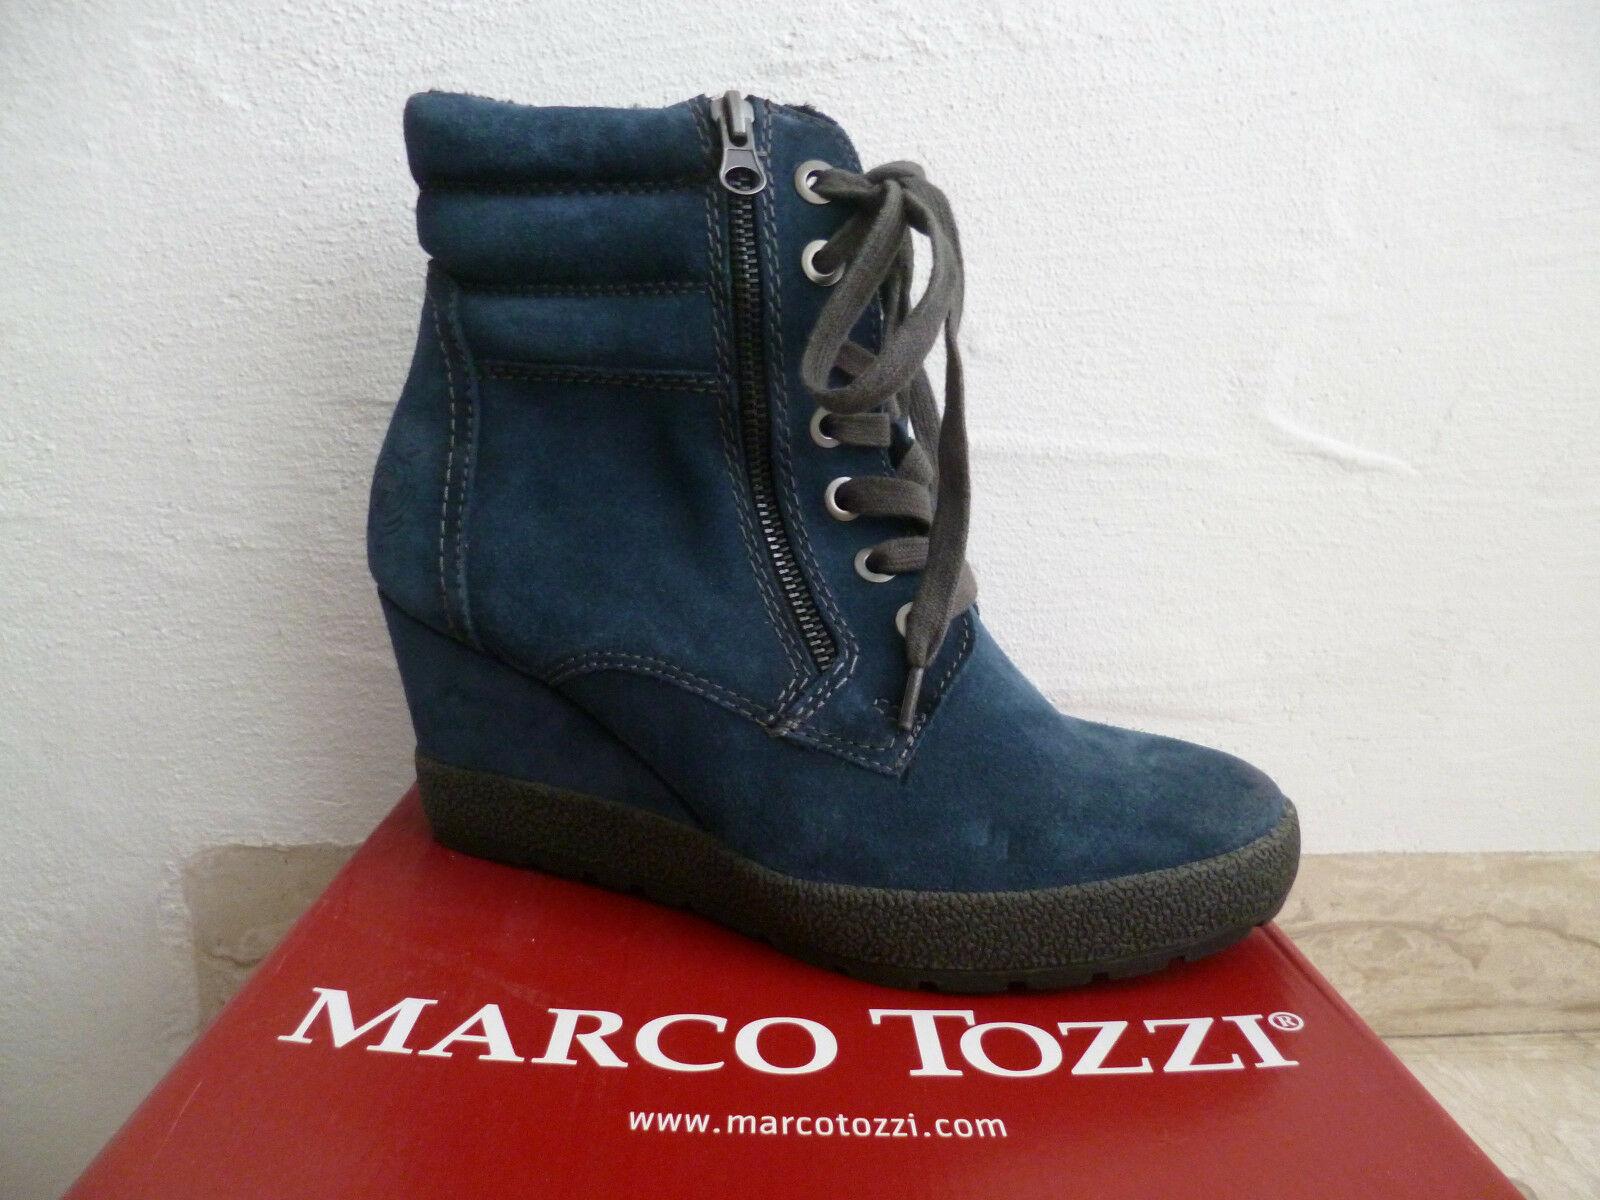 Marco Tozzi Damen Stiefelette Stiefel Winterstiefel Stiefel blau Leder NEU